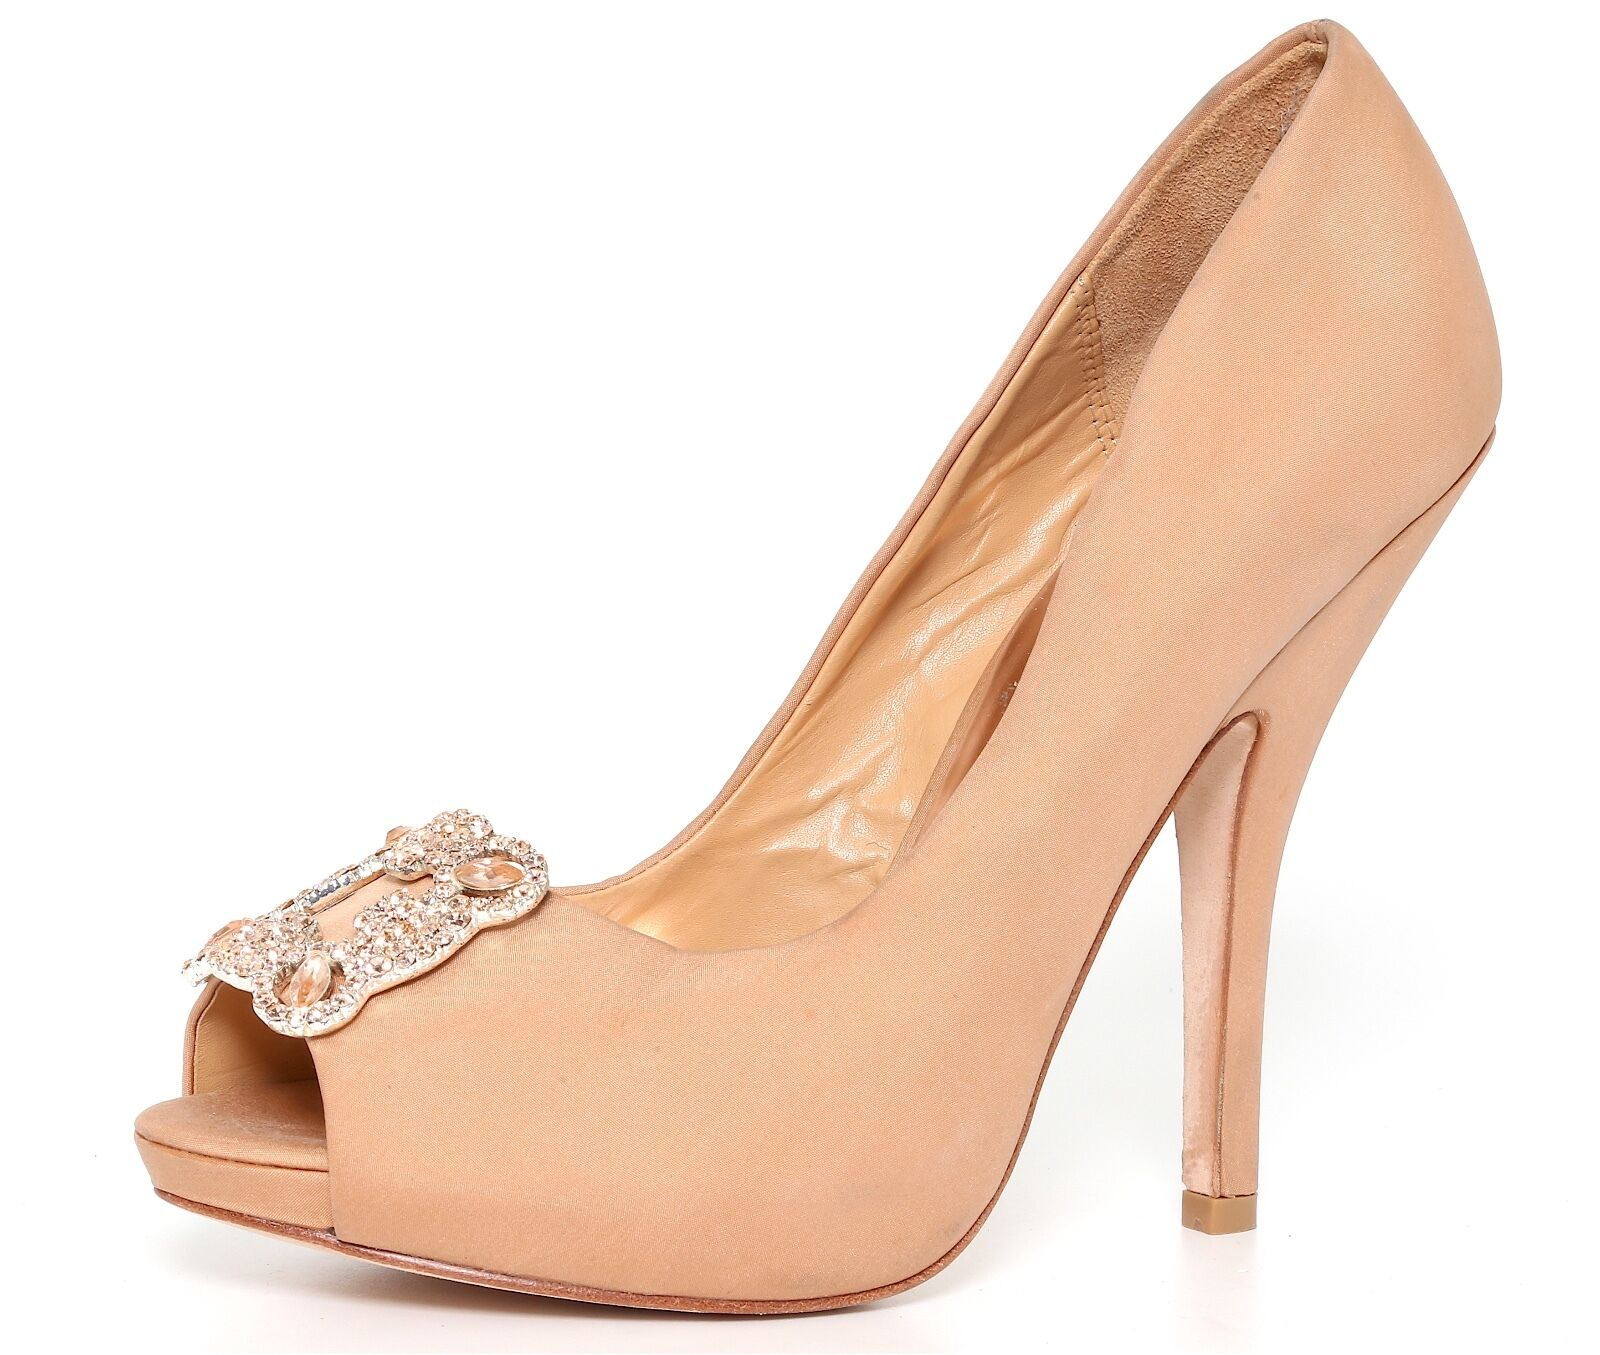 Badgley Mischka Women's Satin Crystal Peep Toe Heels Natural 9500 Sz 7.5 M